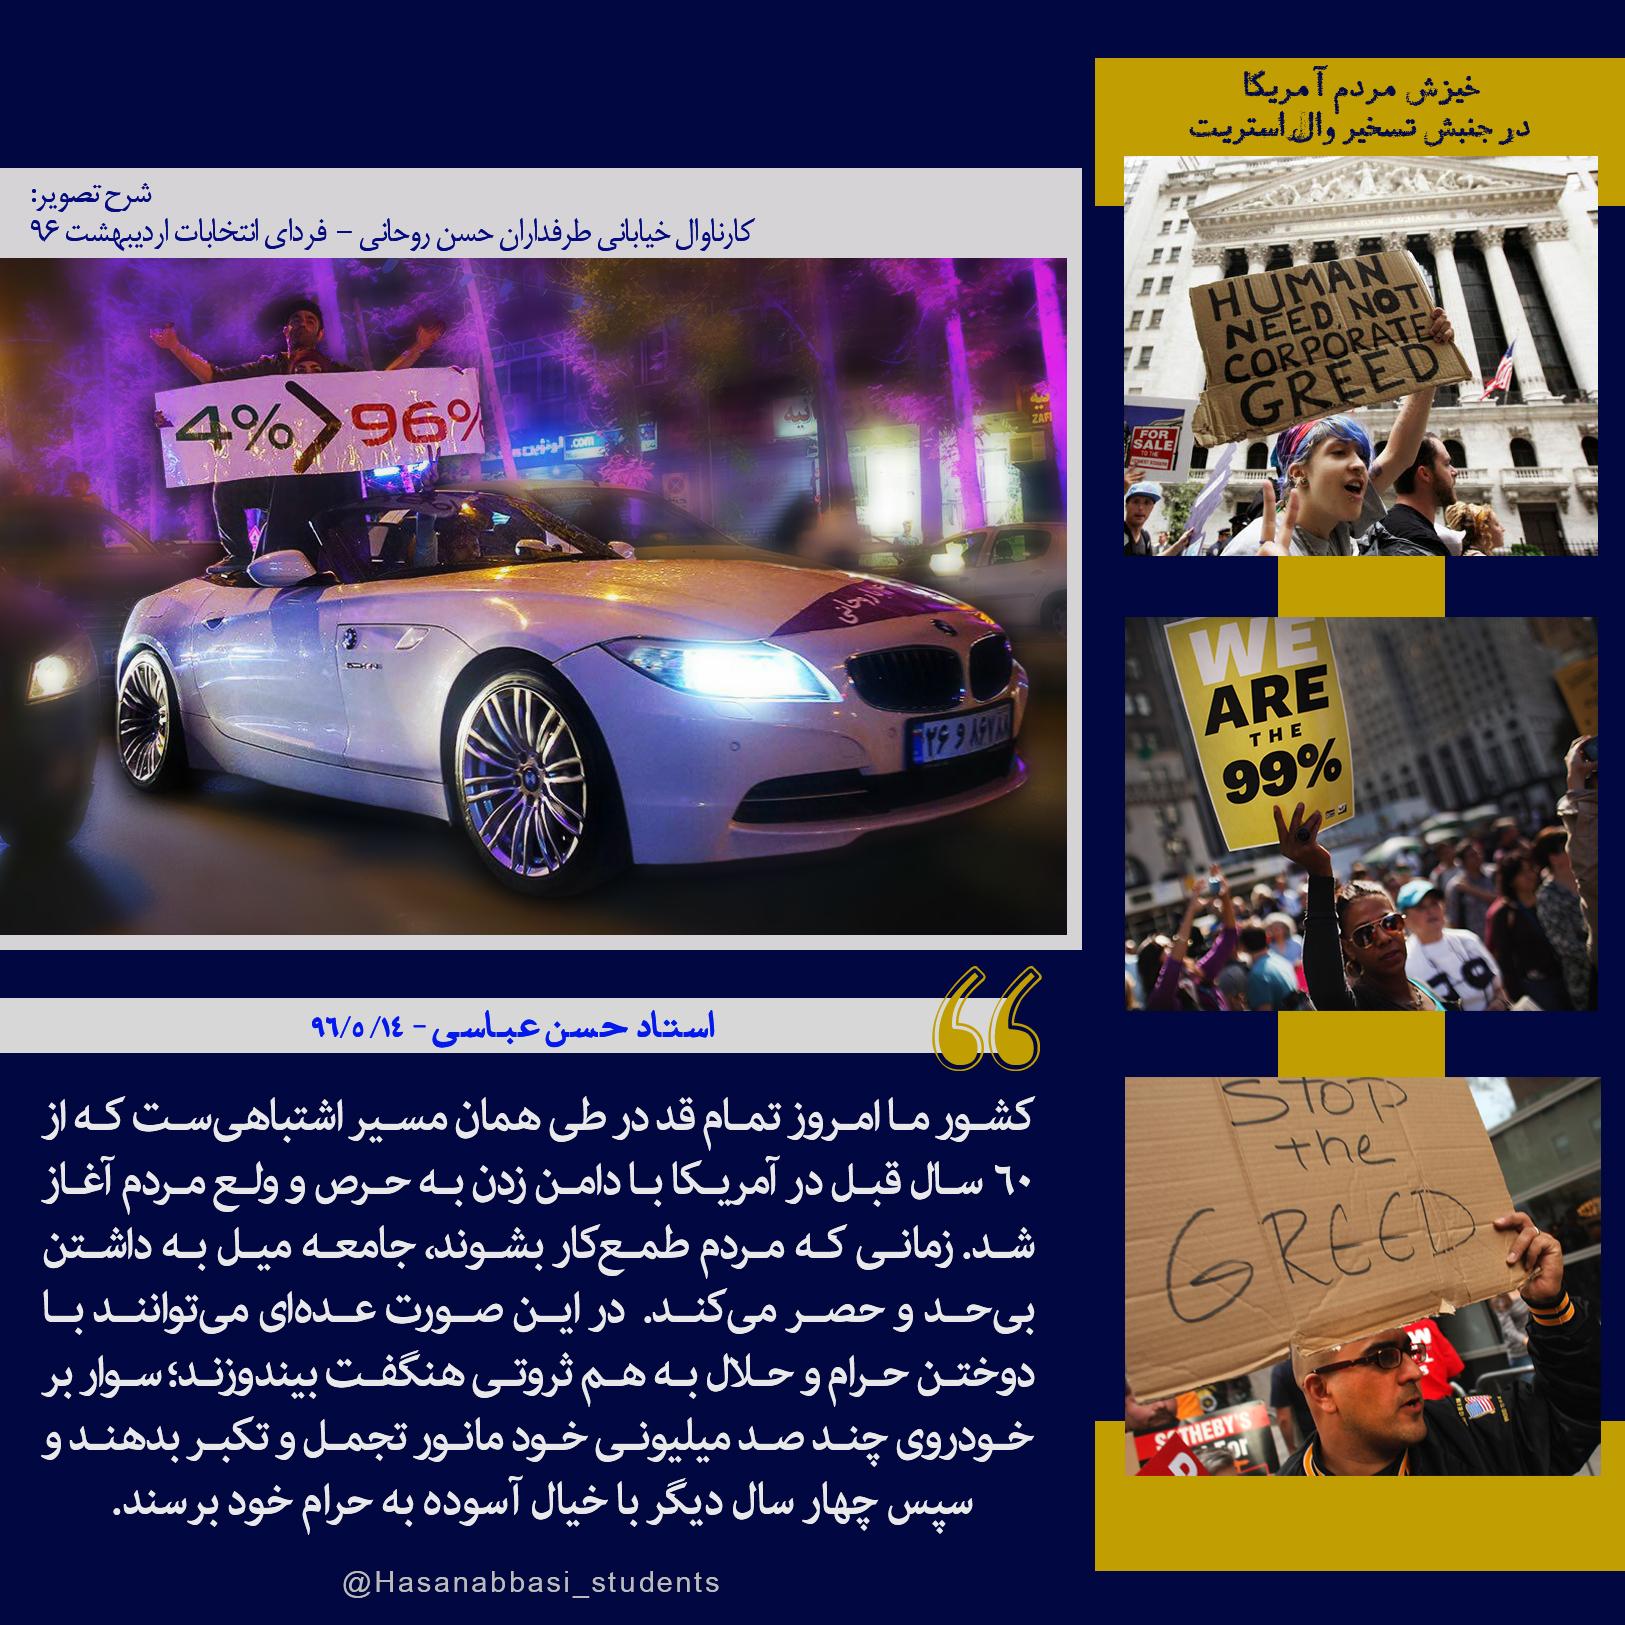 http://dl-abbasi.ir/yekta/1396/Image/Graphics/IMG_G41.jpg